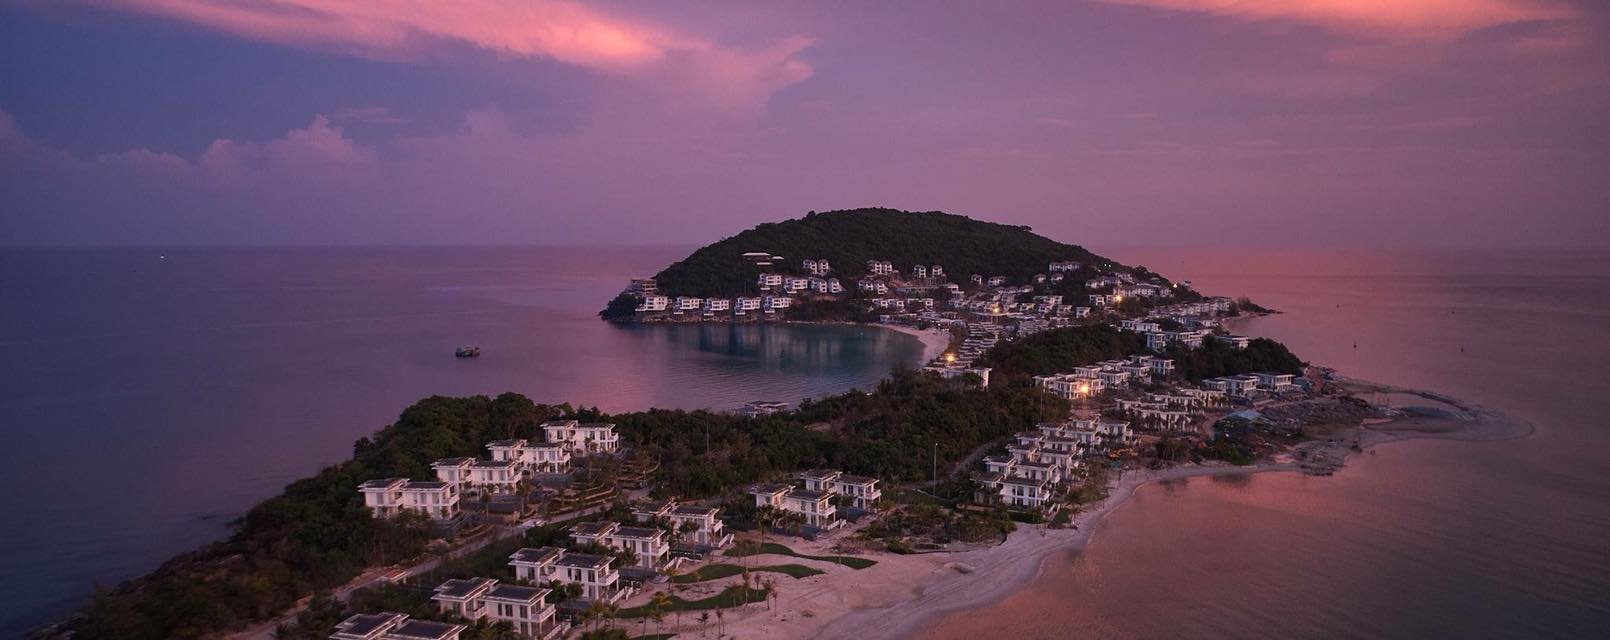 top-resort-phu-quoc-ngam-hoang-hon-dep-nhat-12